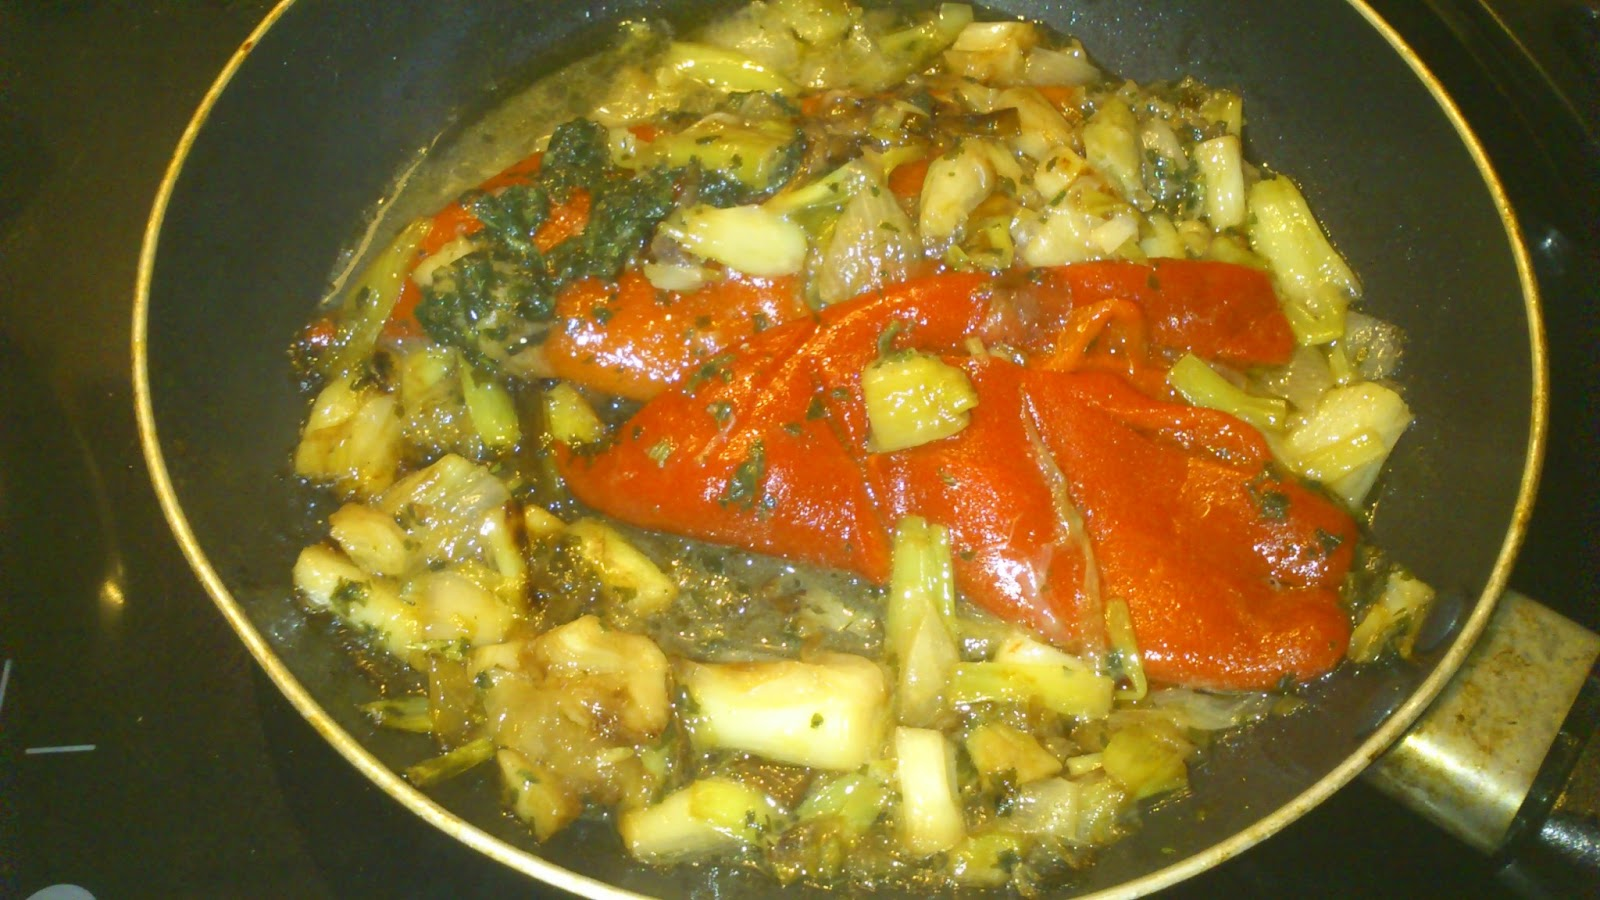 Puré de patata relleno de bacalao en salsa